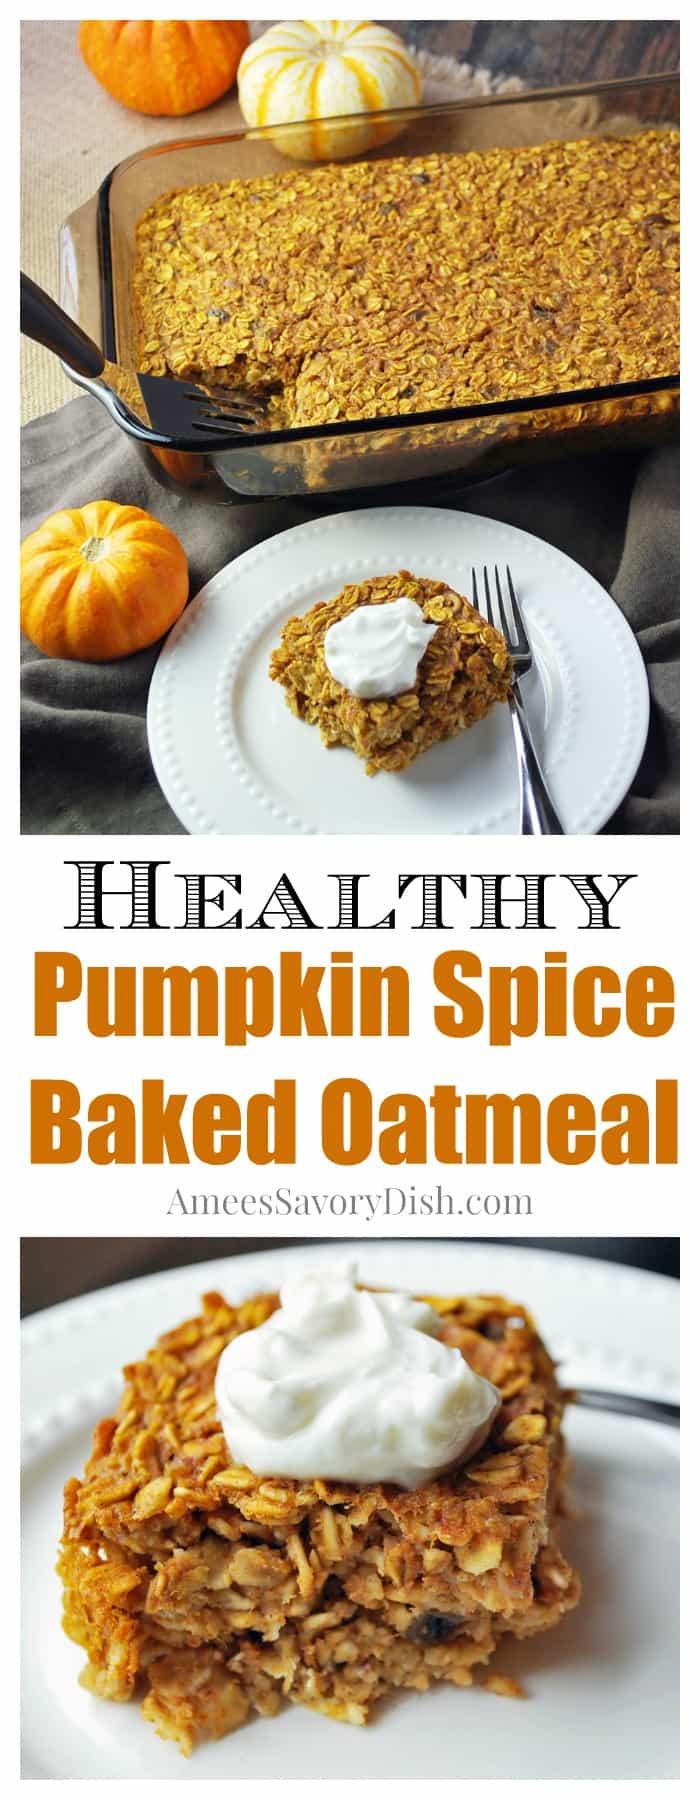 Healthy Pumpkin Spice Baked Oatmeal